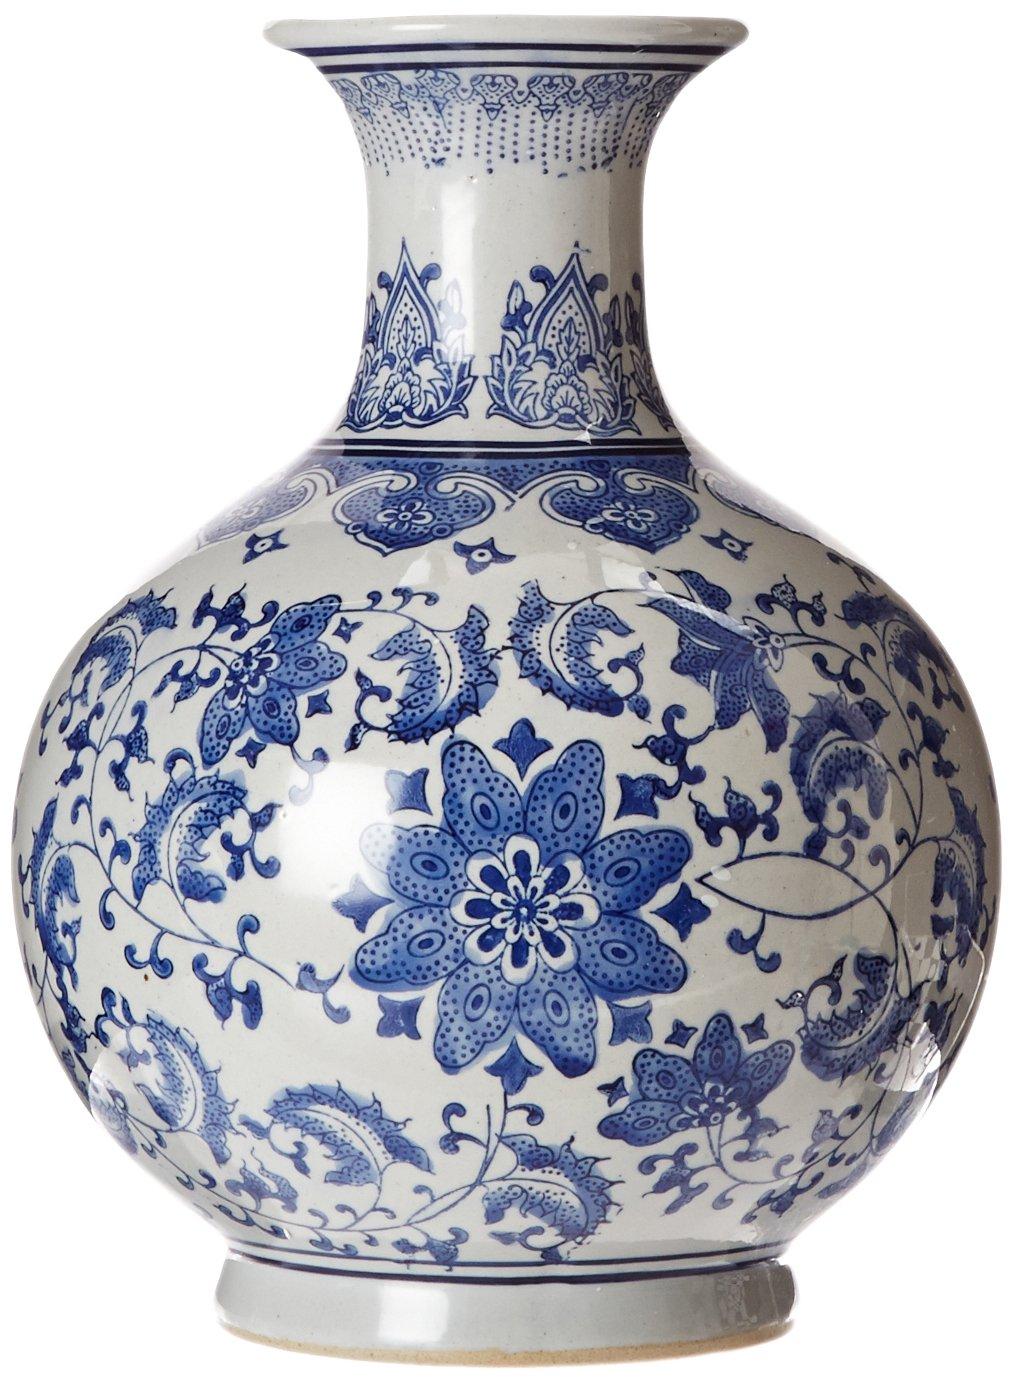 Amazon oriental furniture 12 floral blue white porcelain amazon oriental furniture 12 floral blue white porcelain vase home kitchen floridaeventfo Images